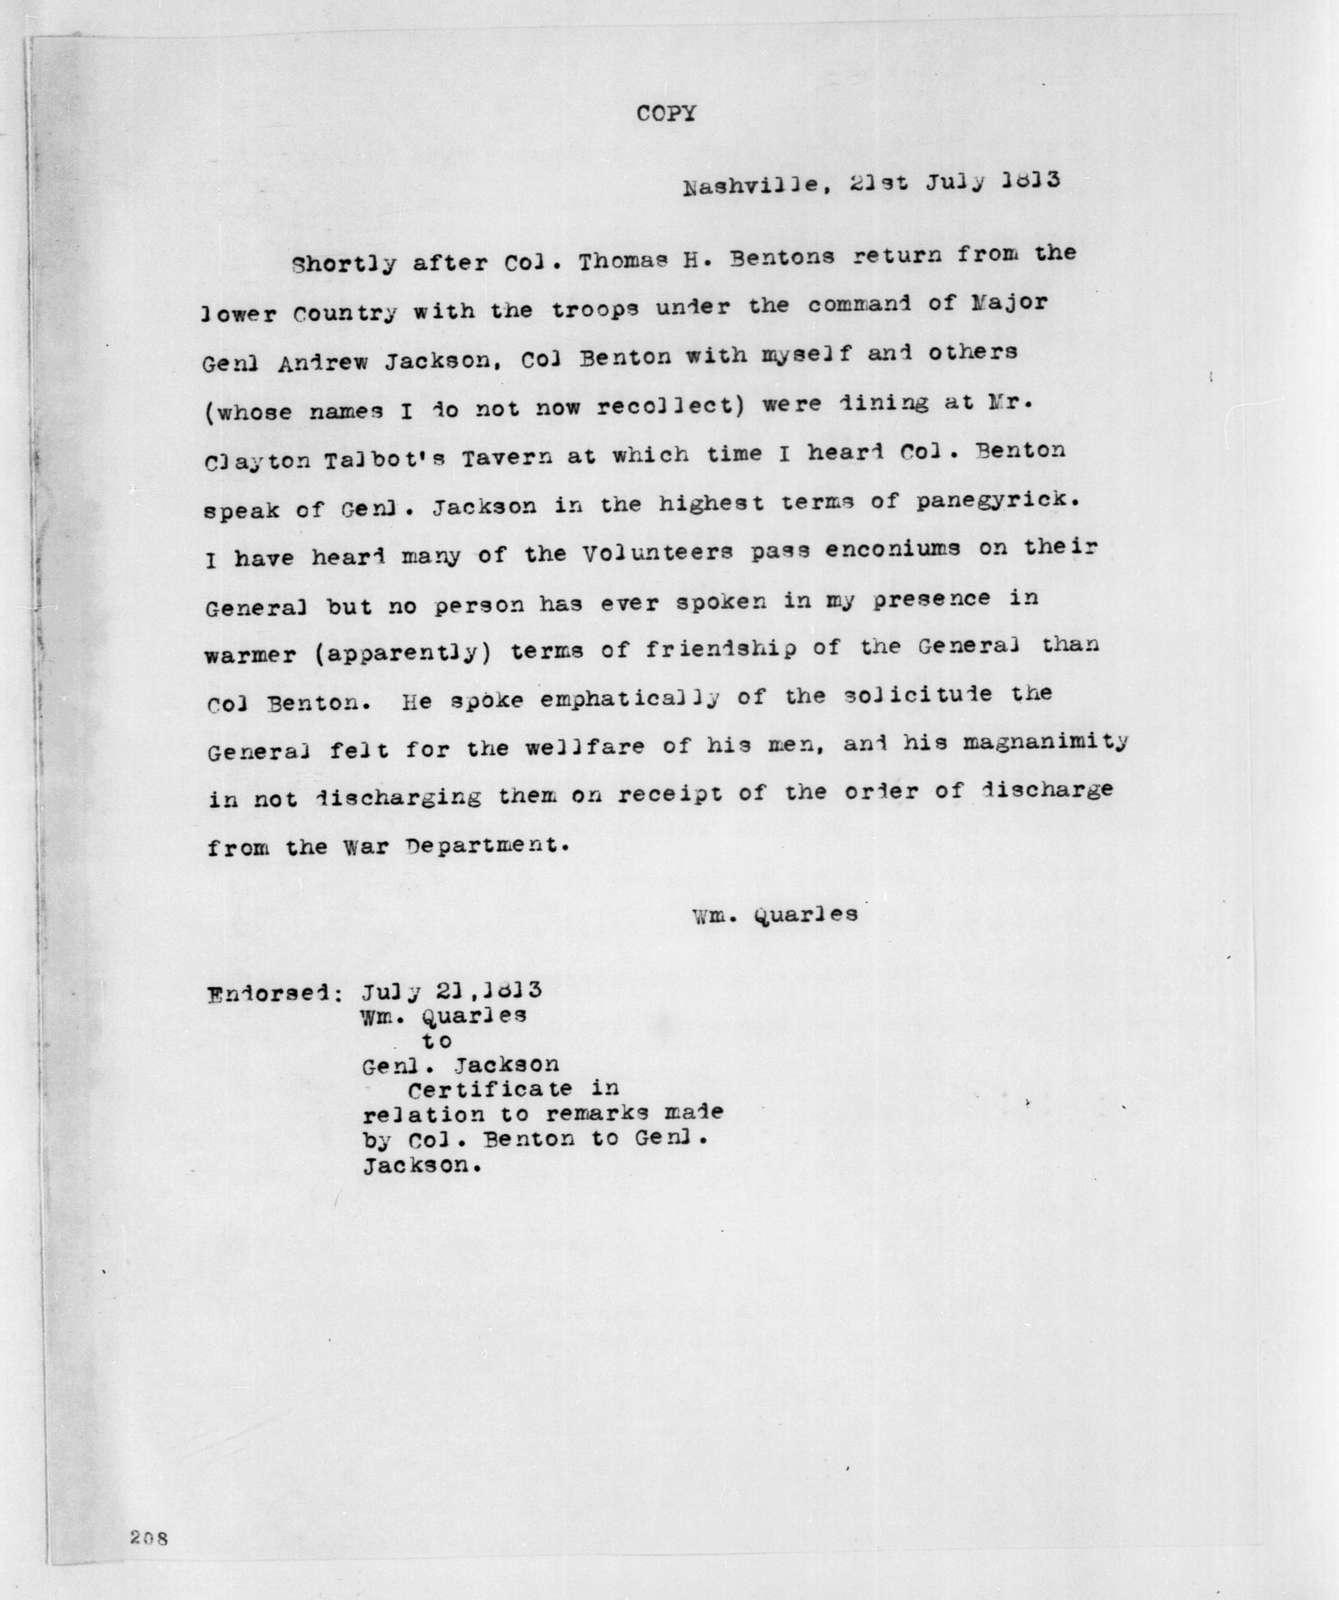 William Quarles to Andrew Jackson, July 21, 1813